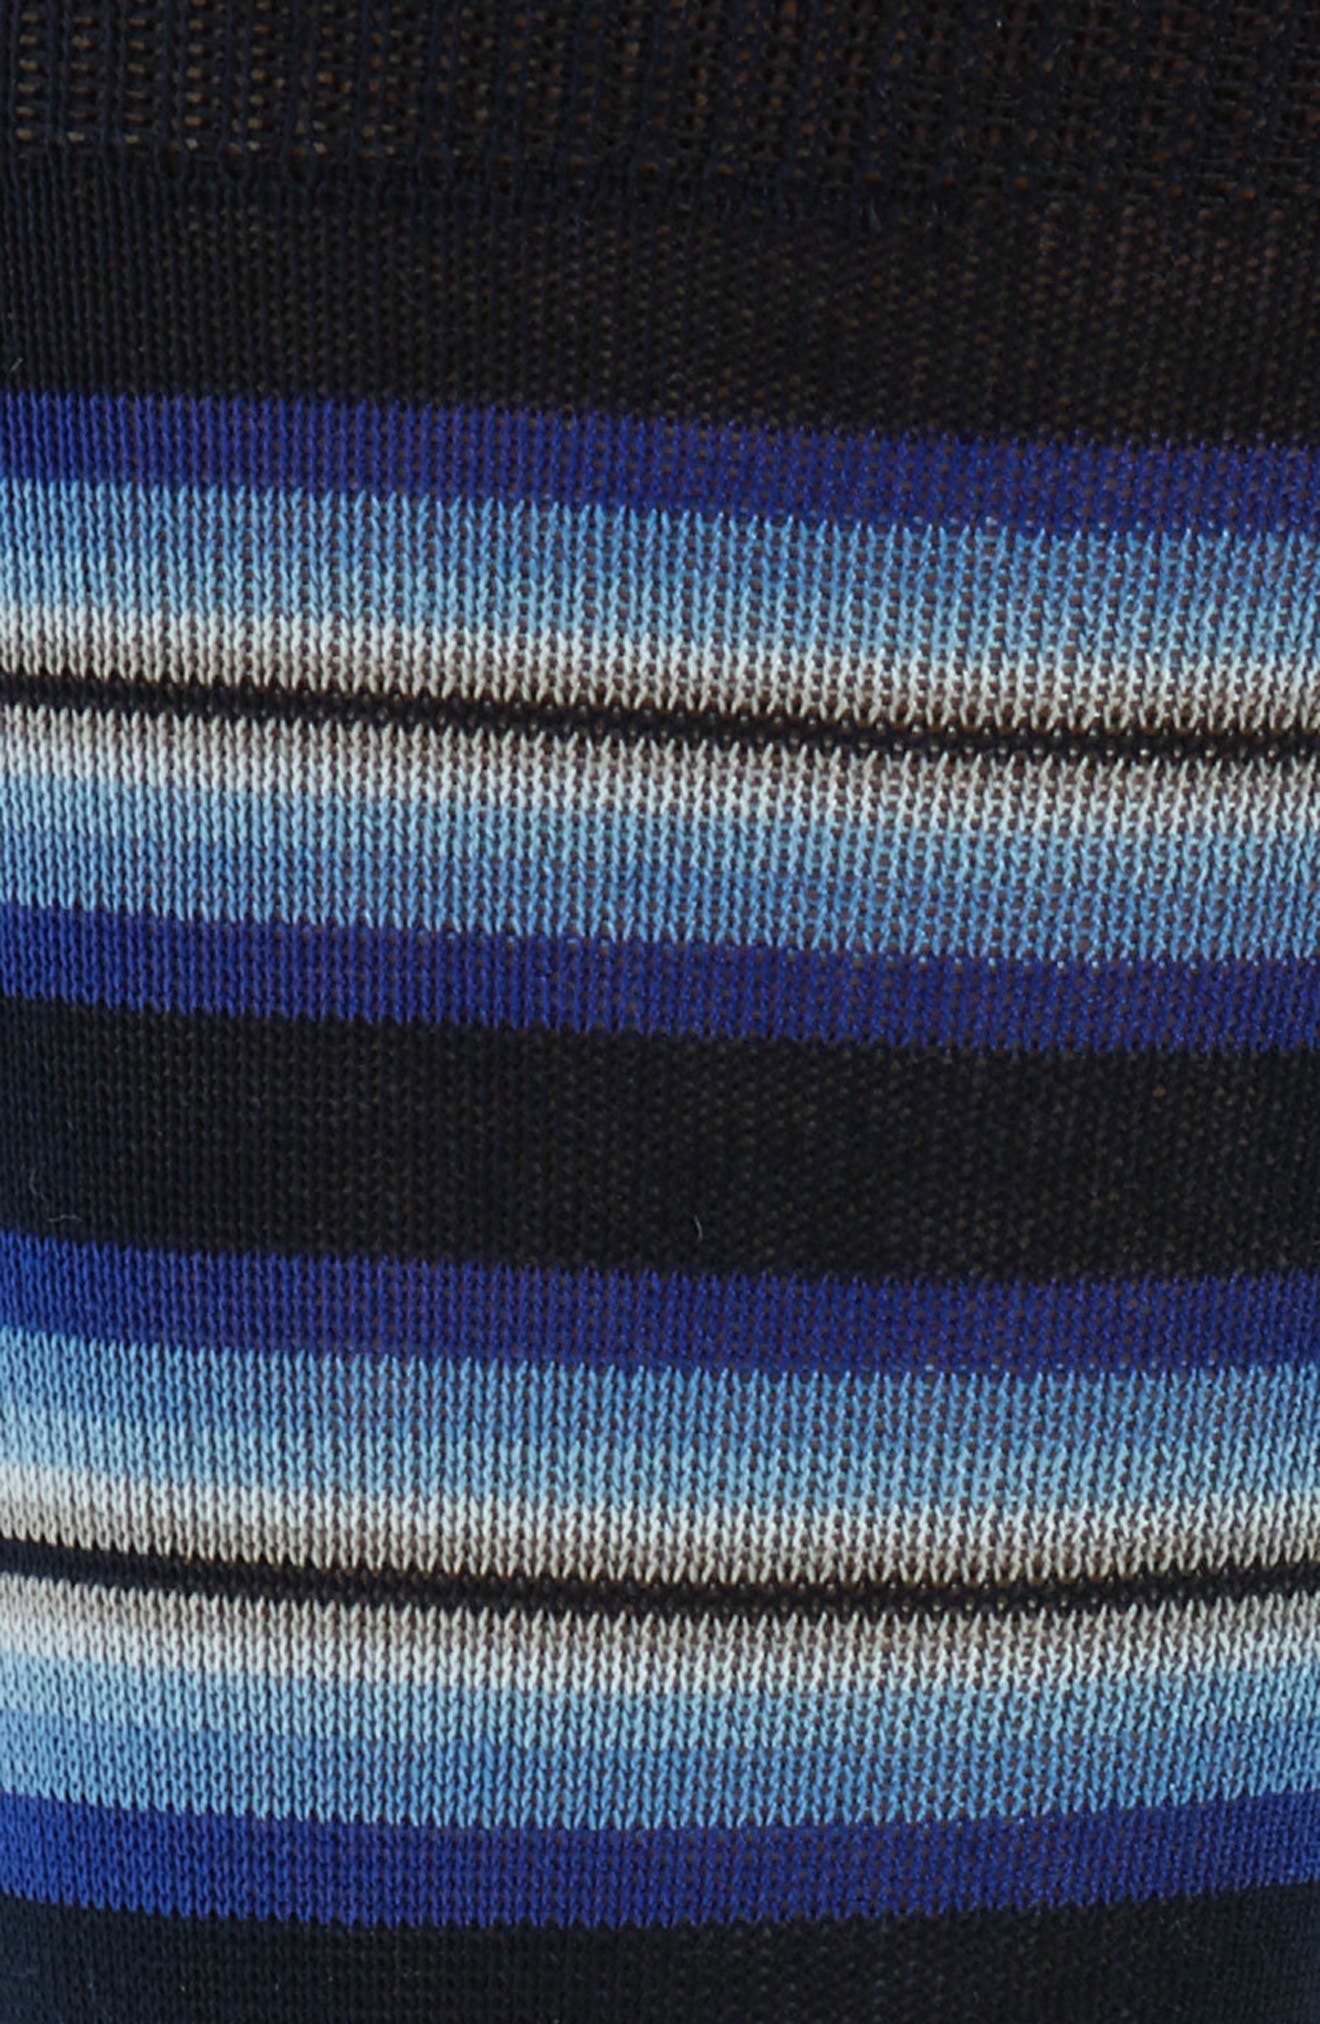 Tiger Stripe Socks,                             Alternate thumbnail 2, color,                             Blue/ Dark Blue